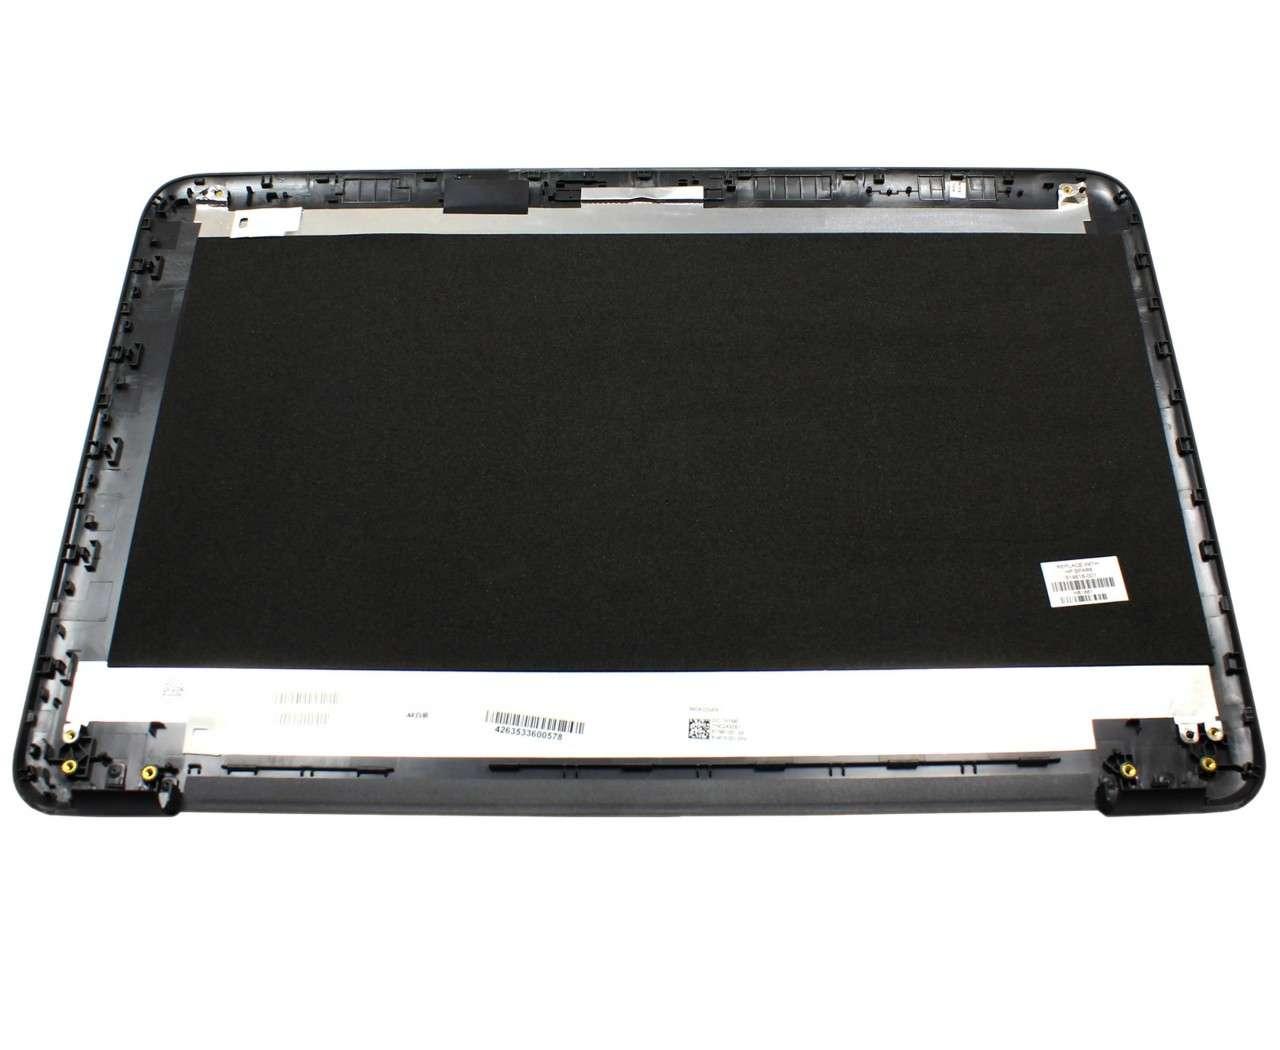 Capac Display BackCover HP 250 G5 Carcasa Display imagine powerlaptop.ro 2021